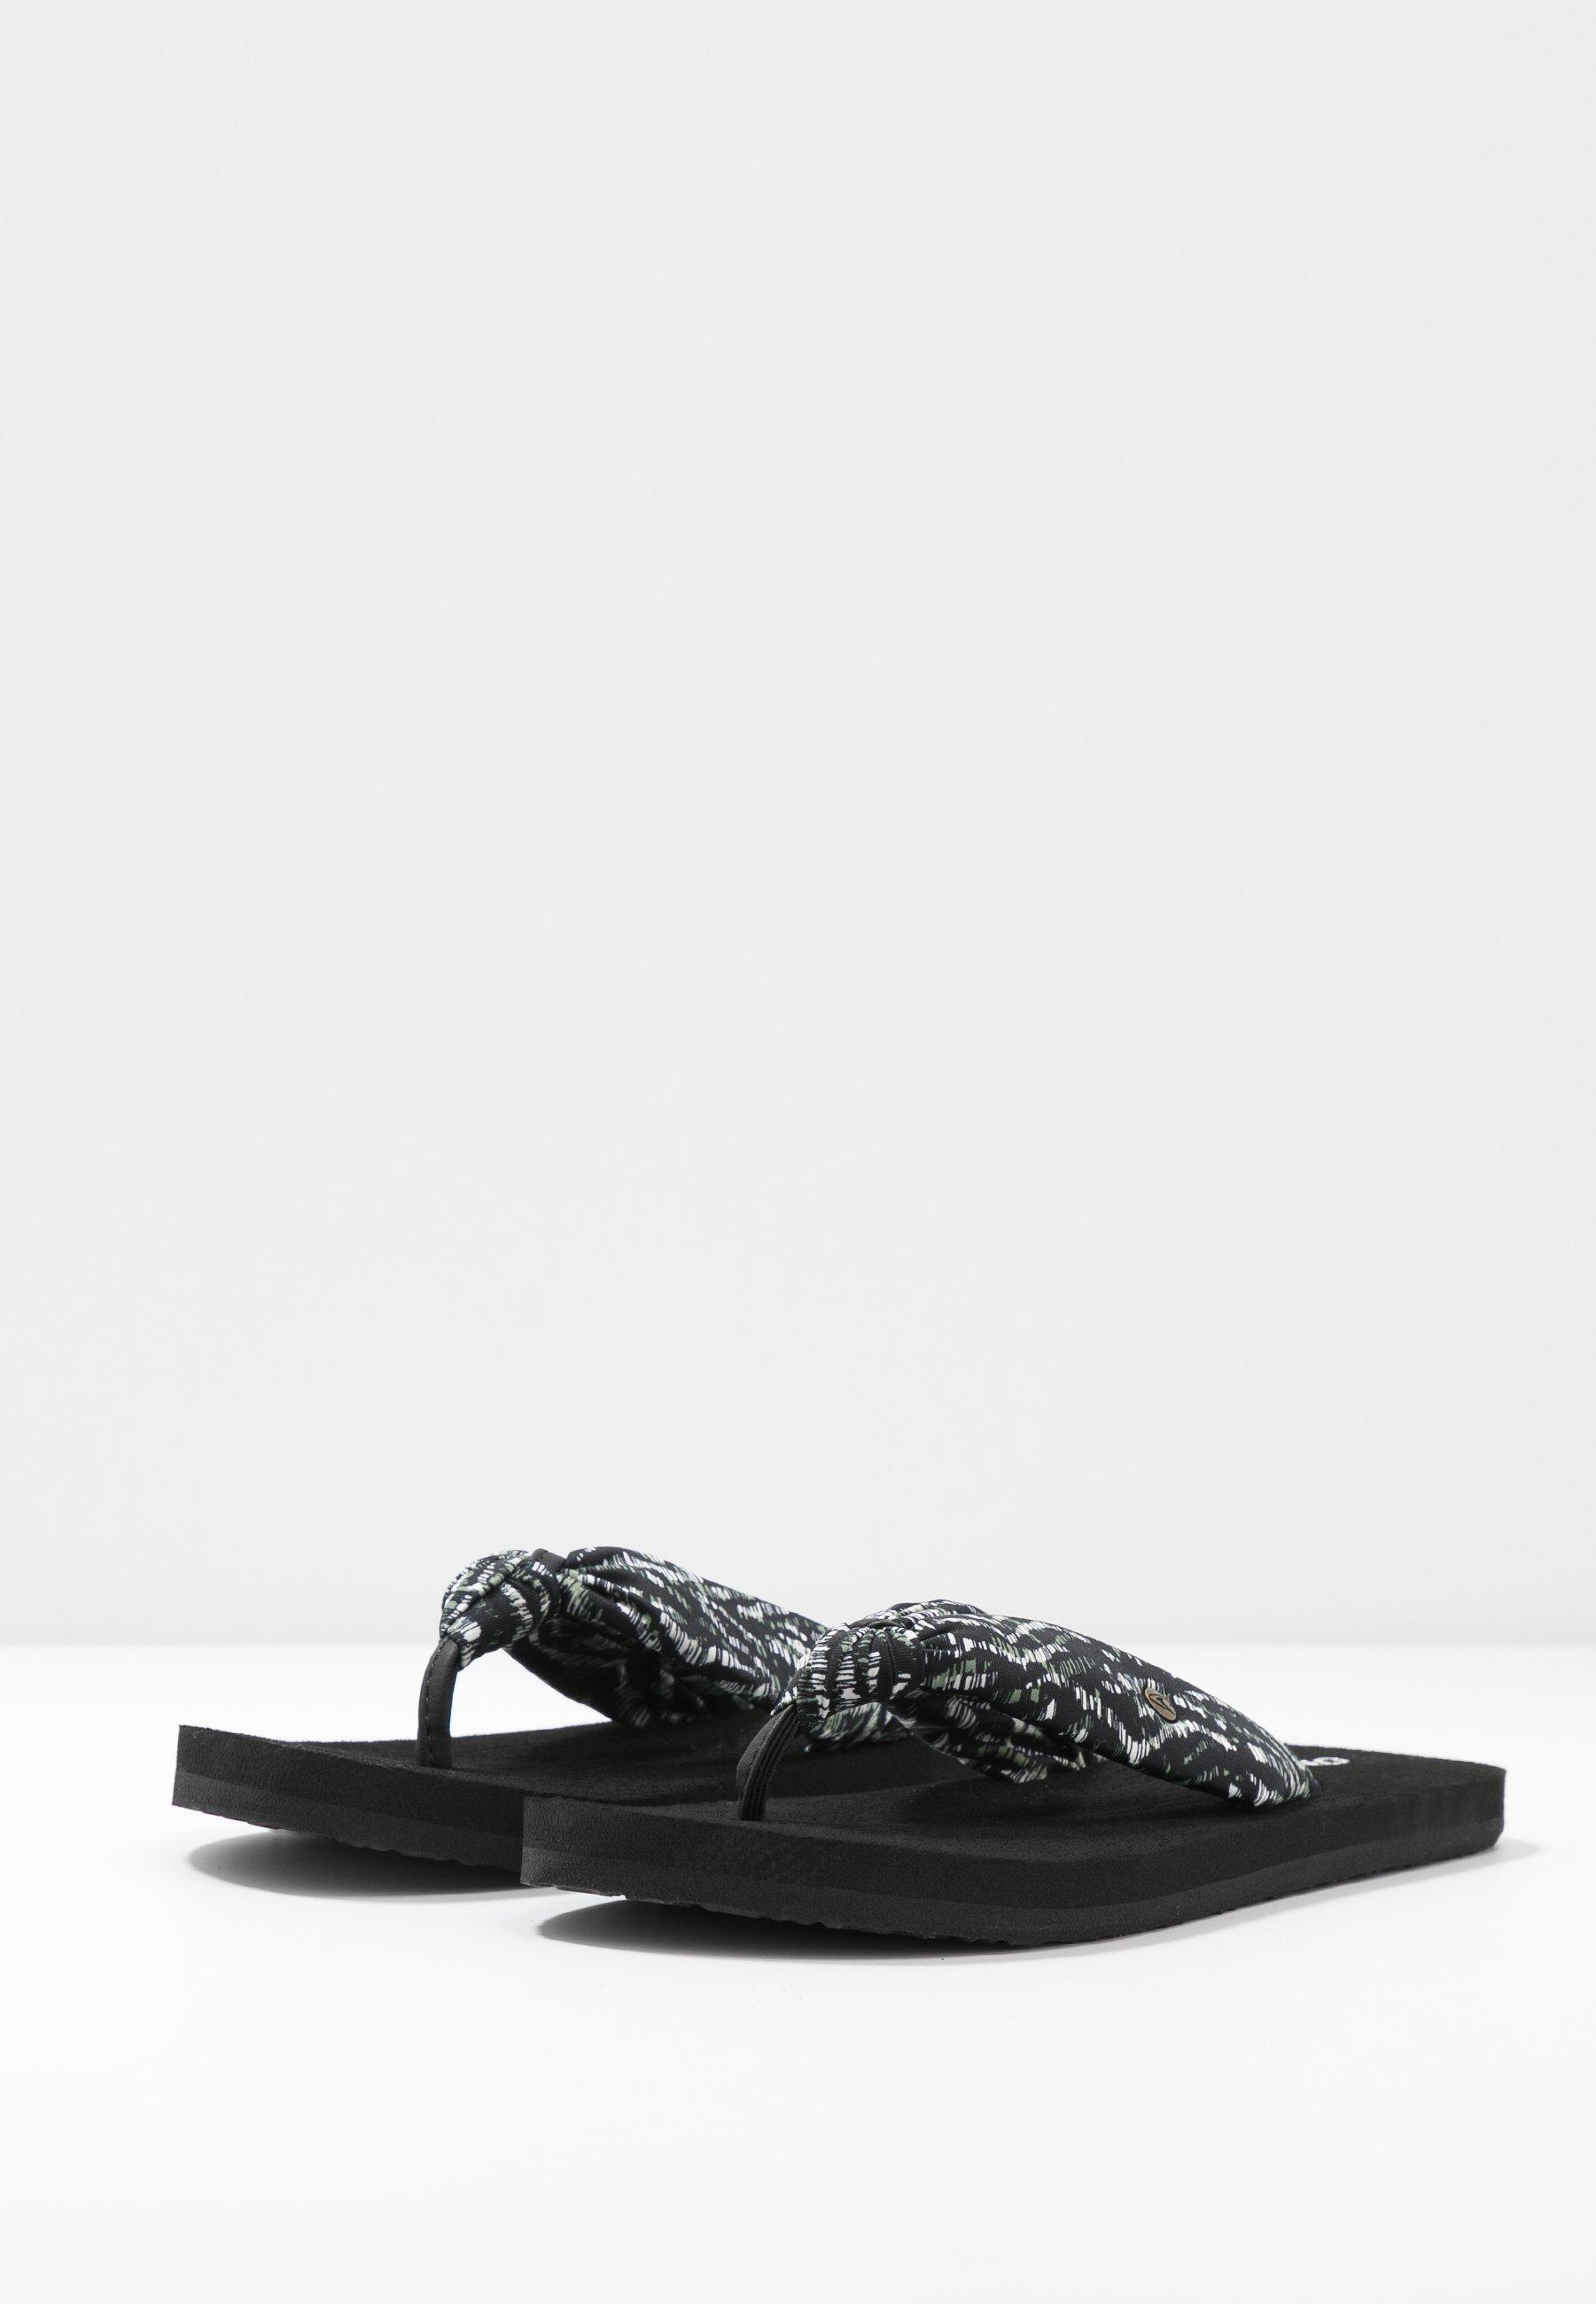 Scarpe da donna O'Neill DITSY SUN Sandali da bagno black/white